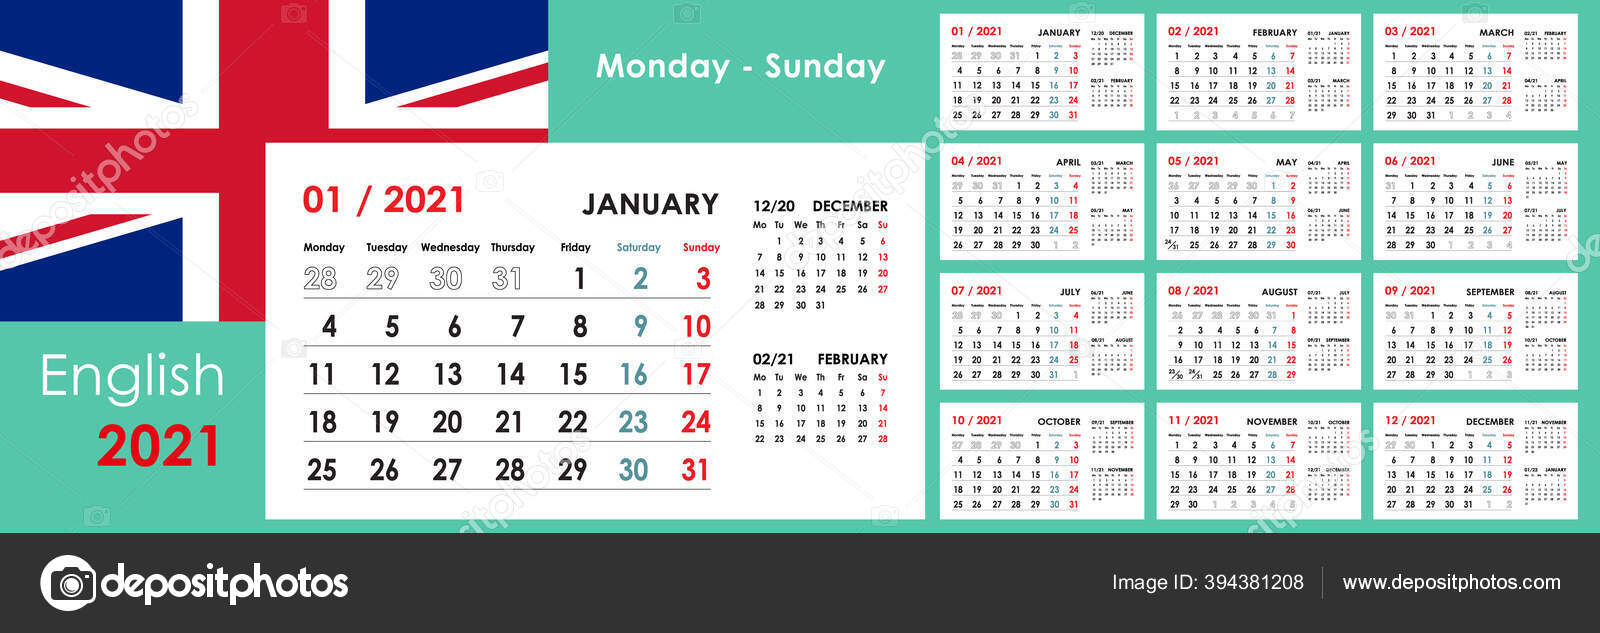 neobux investment strategy 2021 calendar